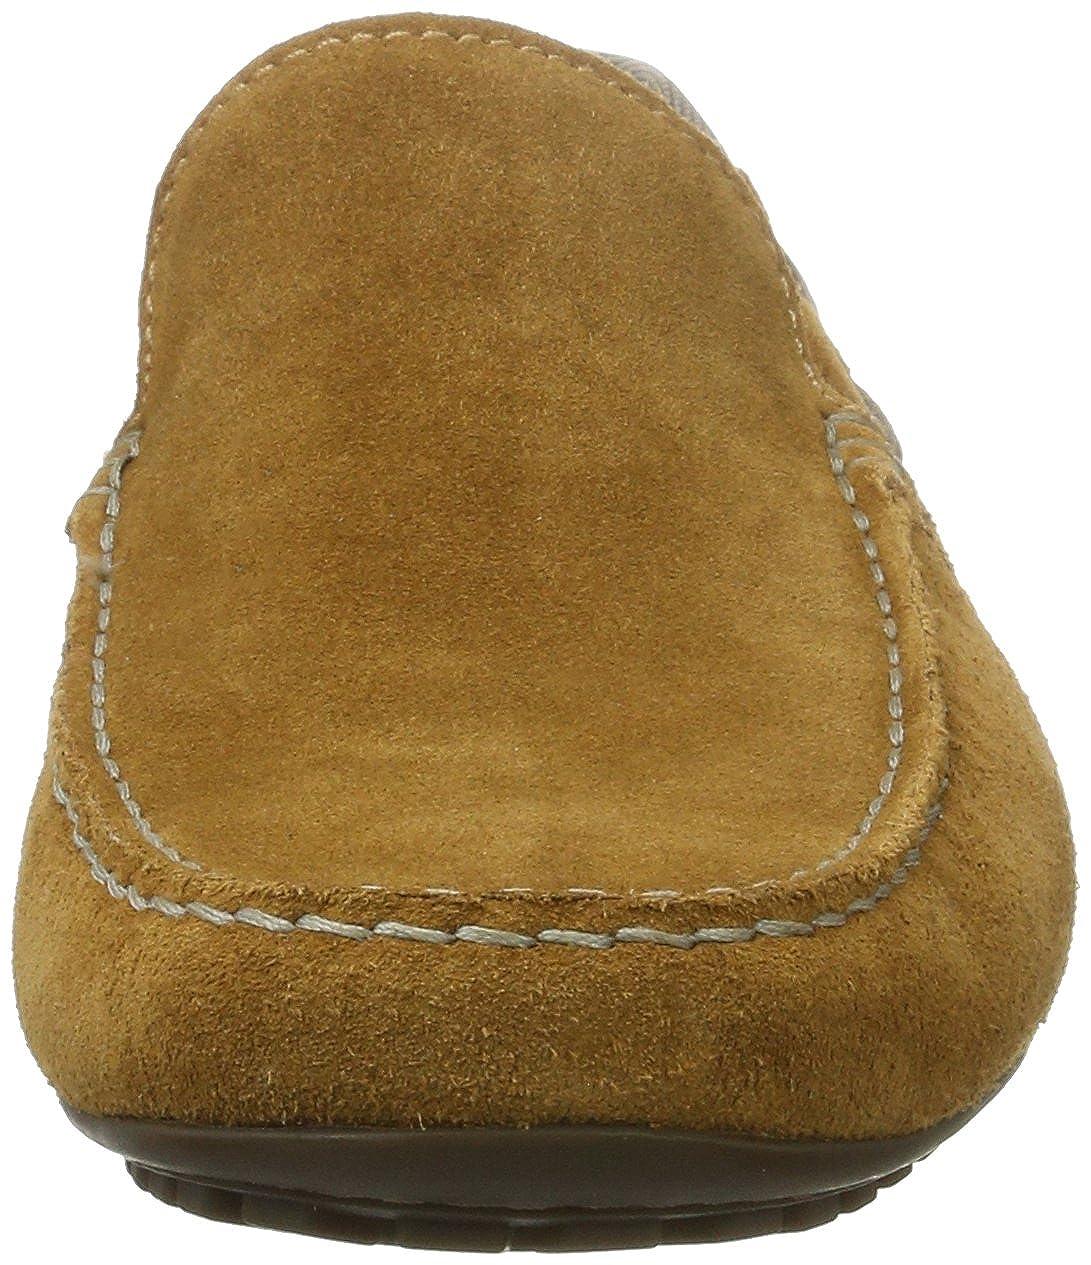 Sioux Herren Cagil Mokassin Braun (Cuoio) (Cuoio) Braun 7c784b